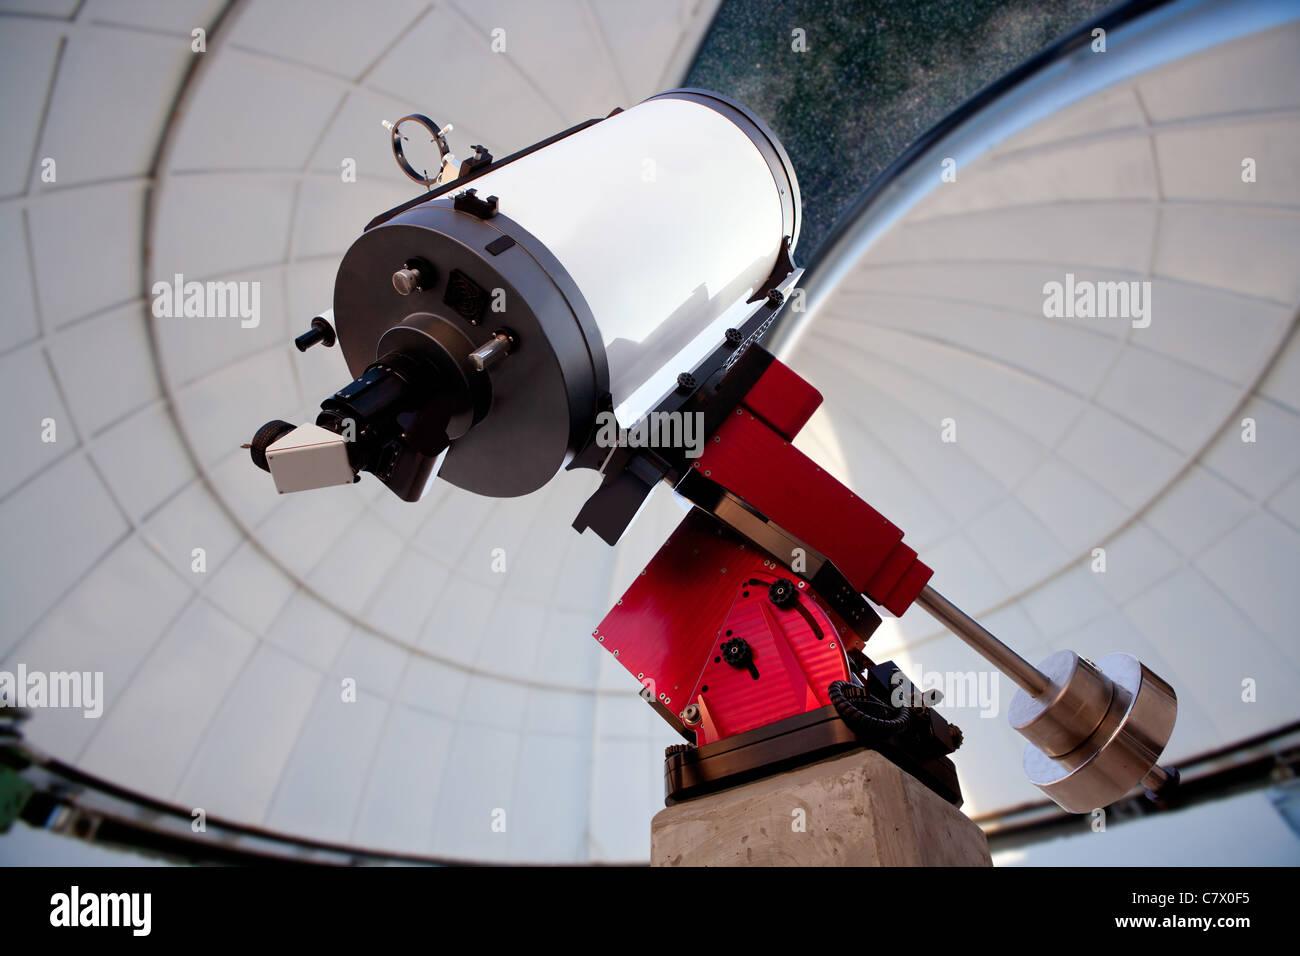 Astronomisches observatorium teleskop indoor nachthimmel stockfoto